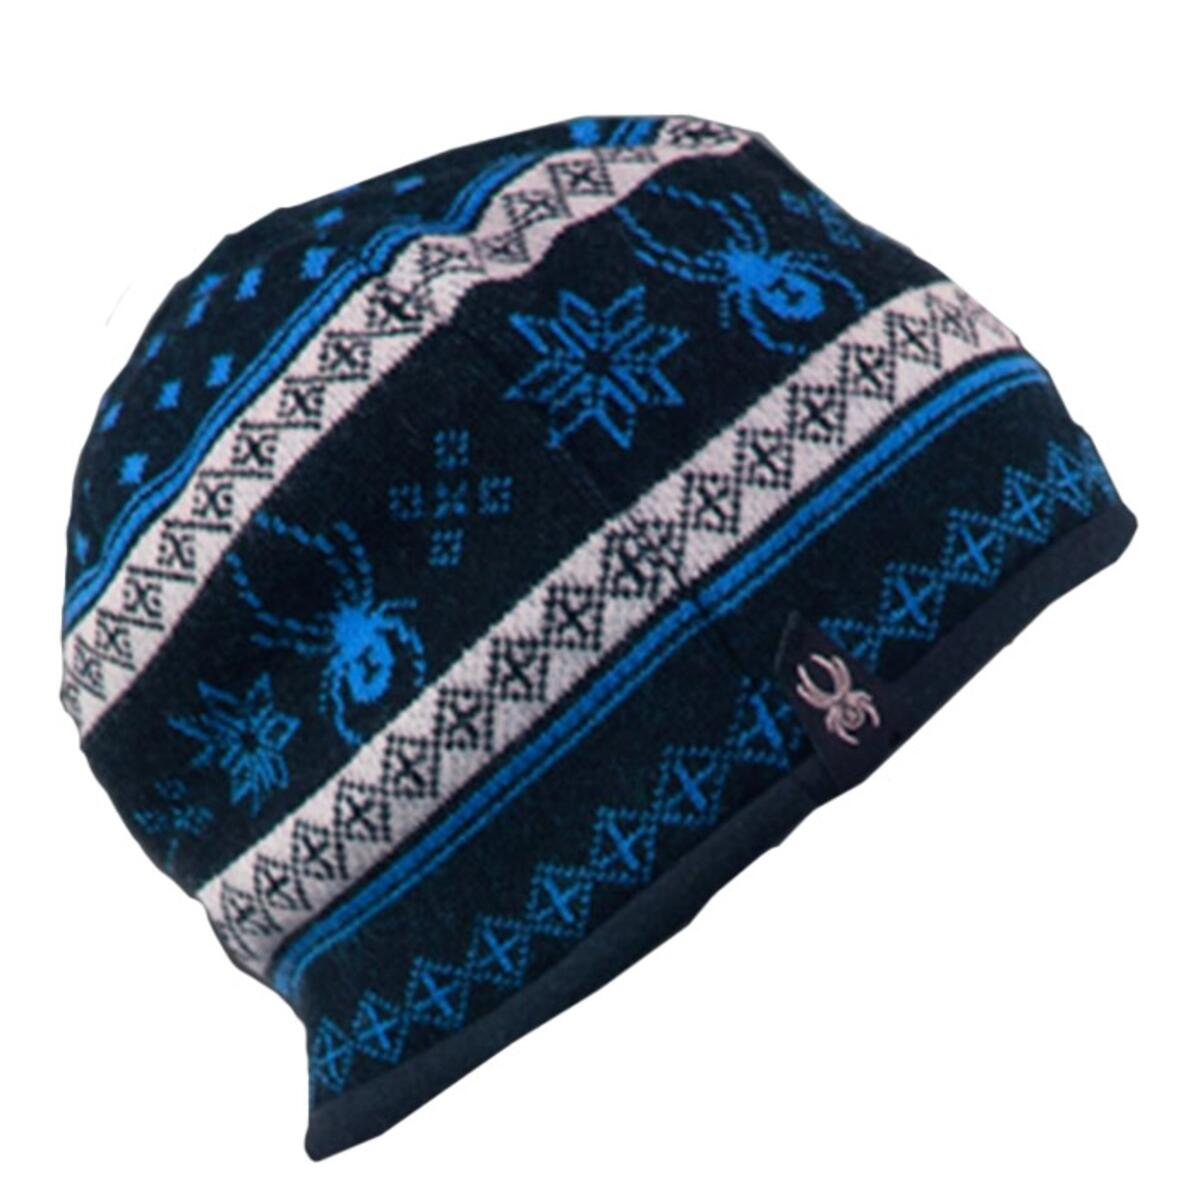 Spyder Mens Courmayeur Ski Beanie Hat